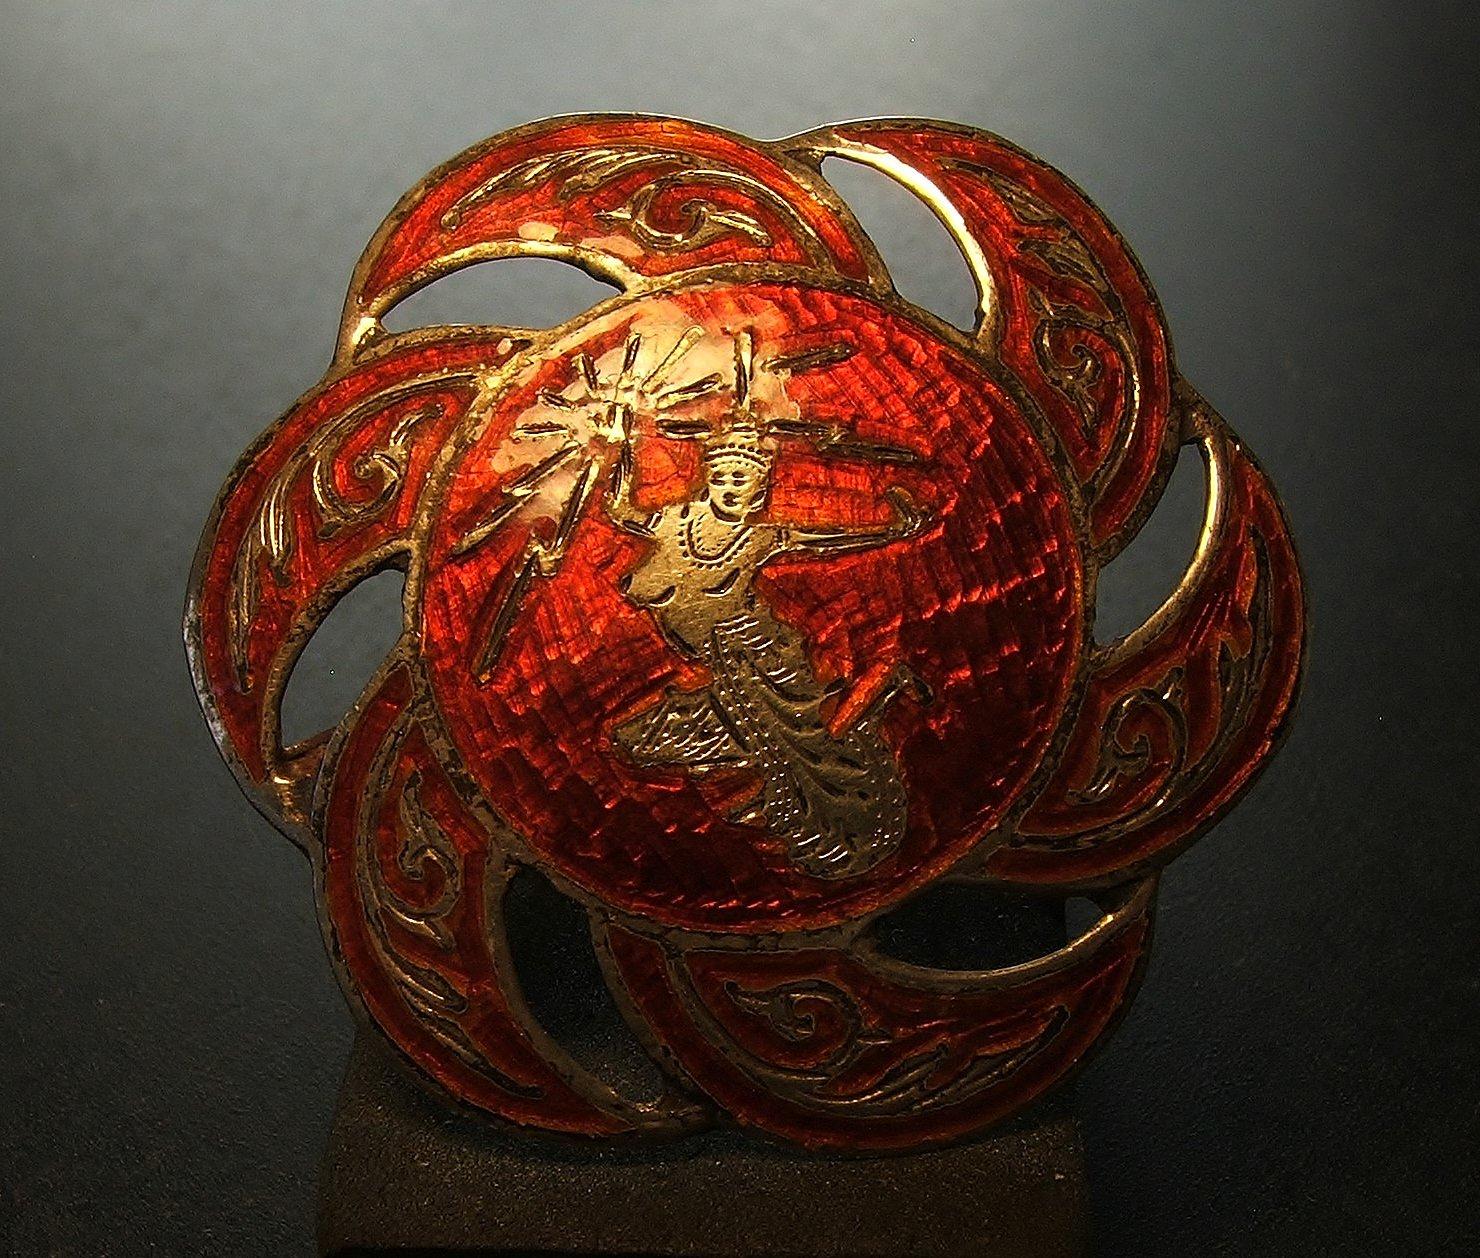 Siam Sterling Silver & Red Enamel Brooch c.1949